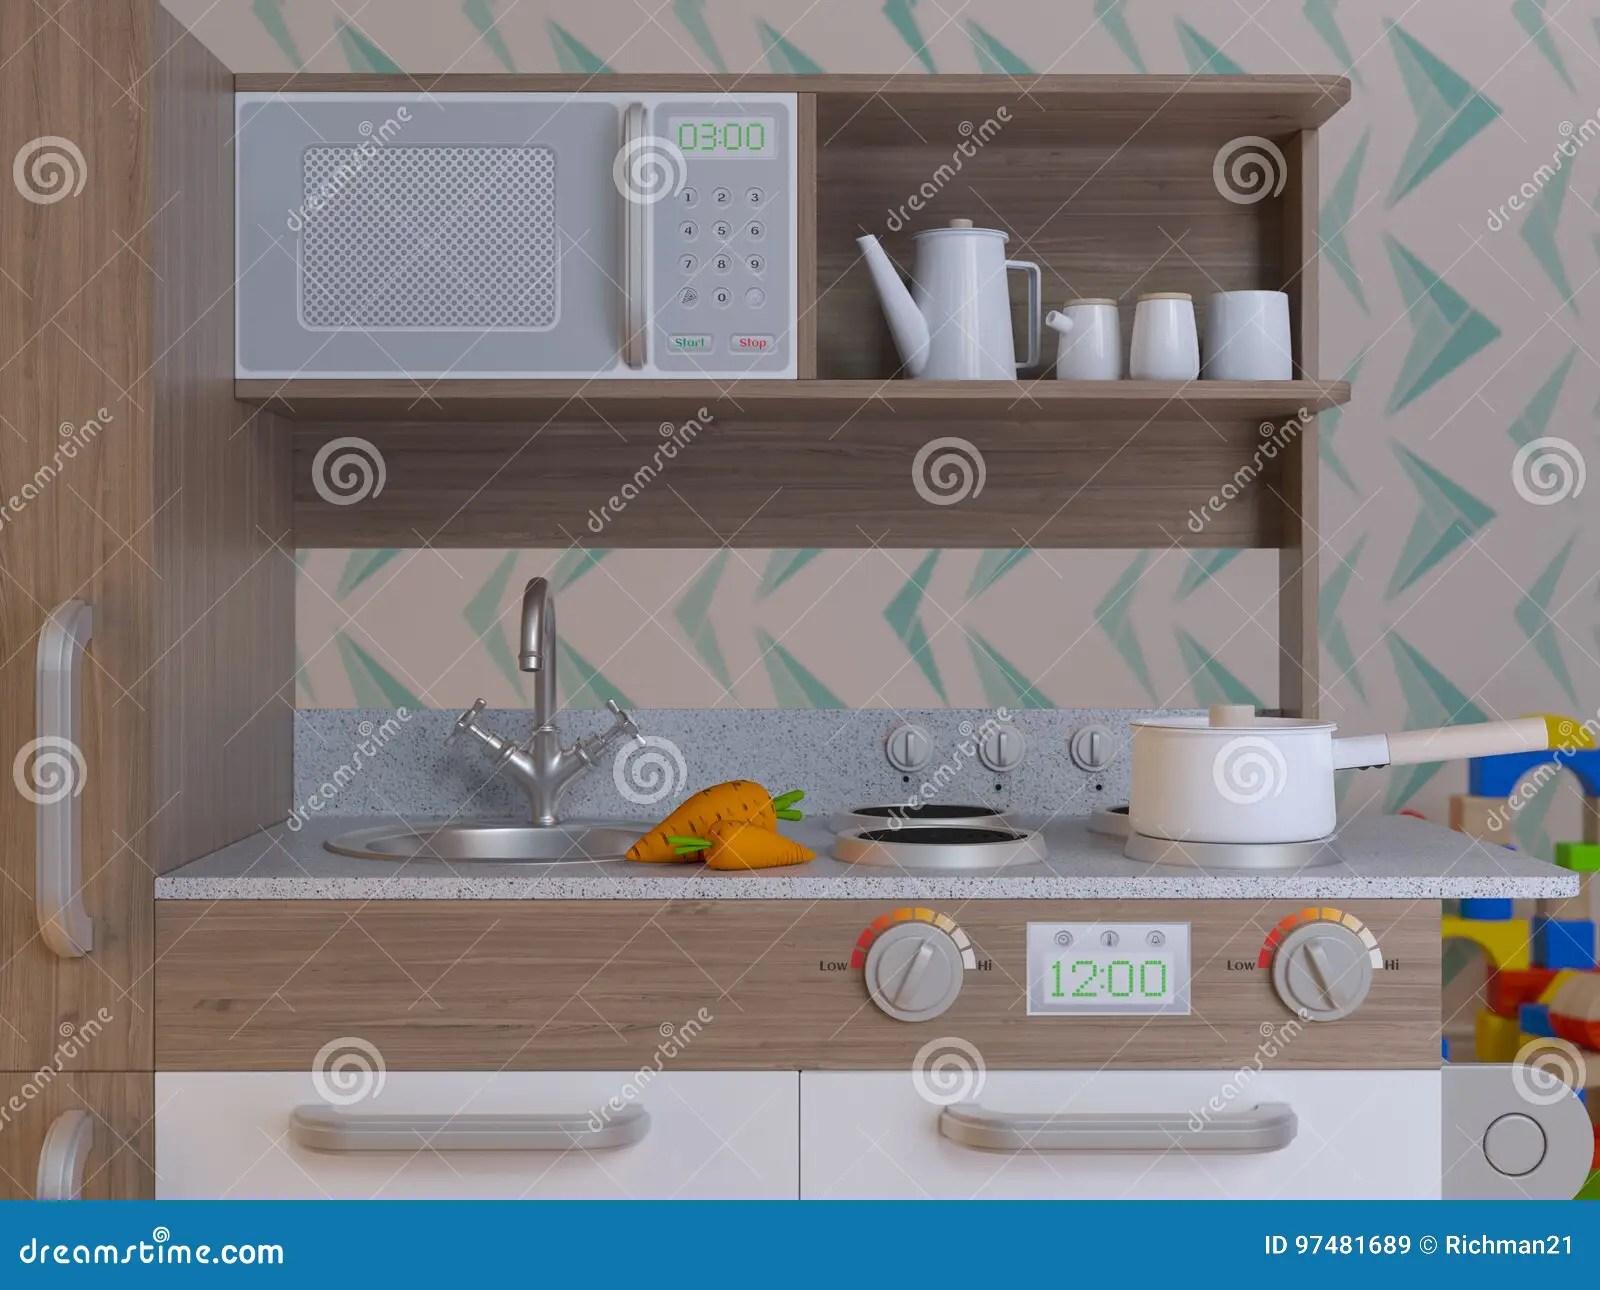 kitchen aid cabinets utility cart 儿童厨房设计内部戏剧设置了与辅助部件库存例证 插画包括有乐趣 内部 儿童厨房烹调的设计内部假装戏剧设置与辅助部件3d例证哄骗厨房聪明的playset 回报图象